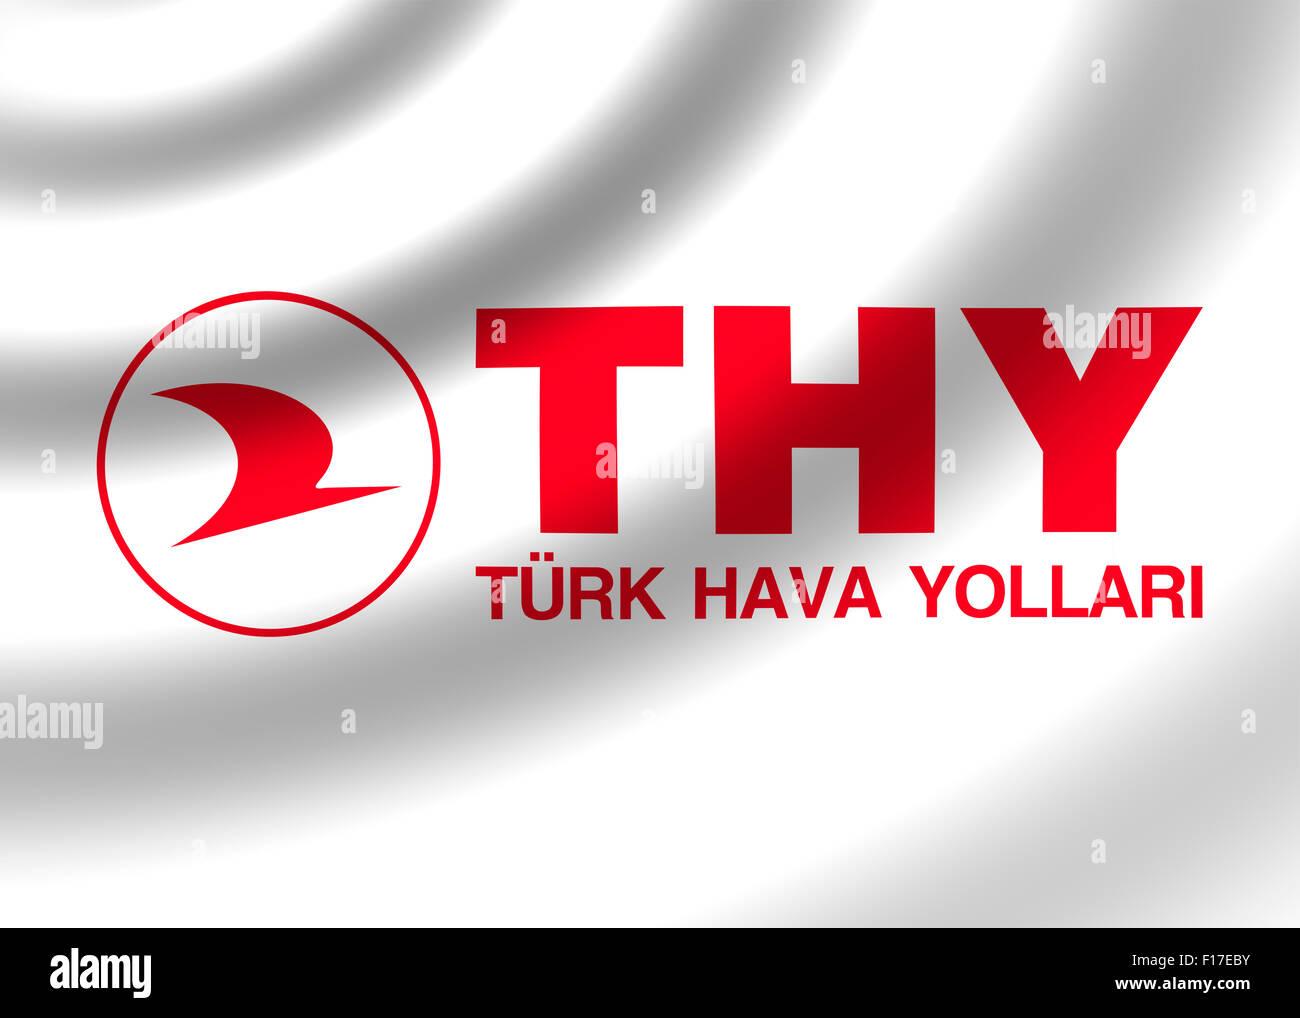 Turkish Airlines - THY - Turkish Airlines Logo - turkishairlines.com